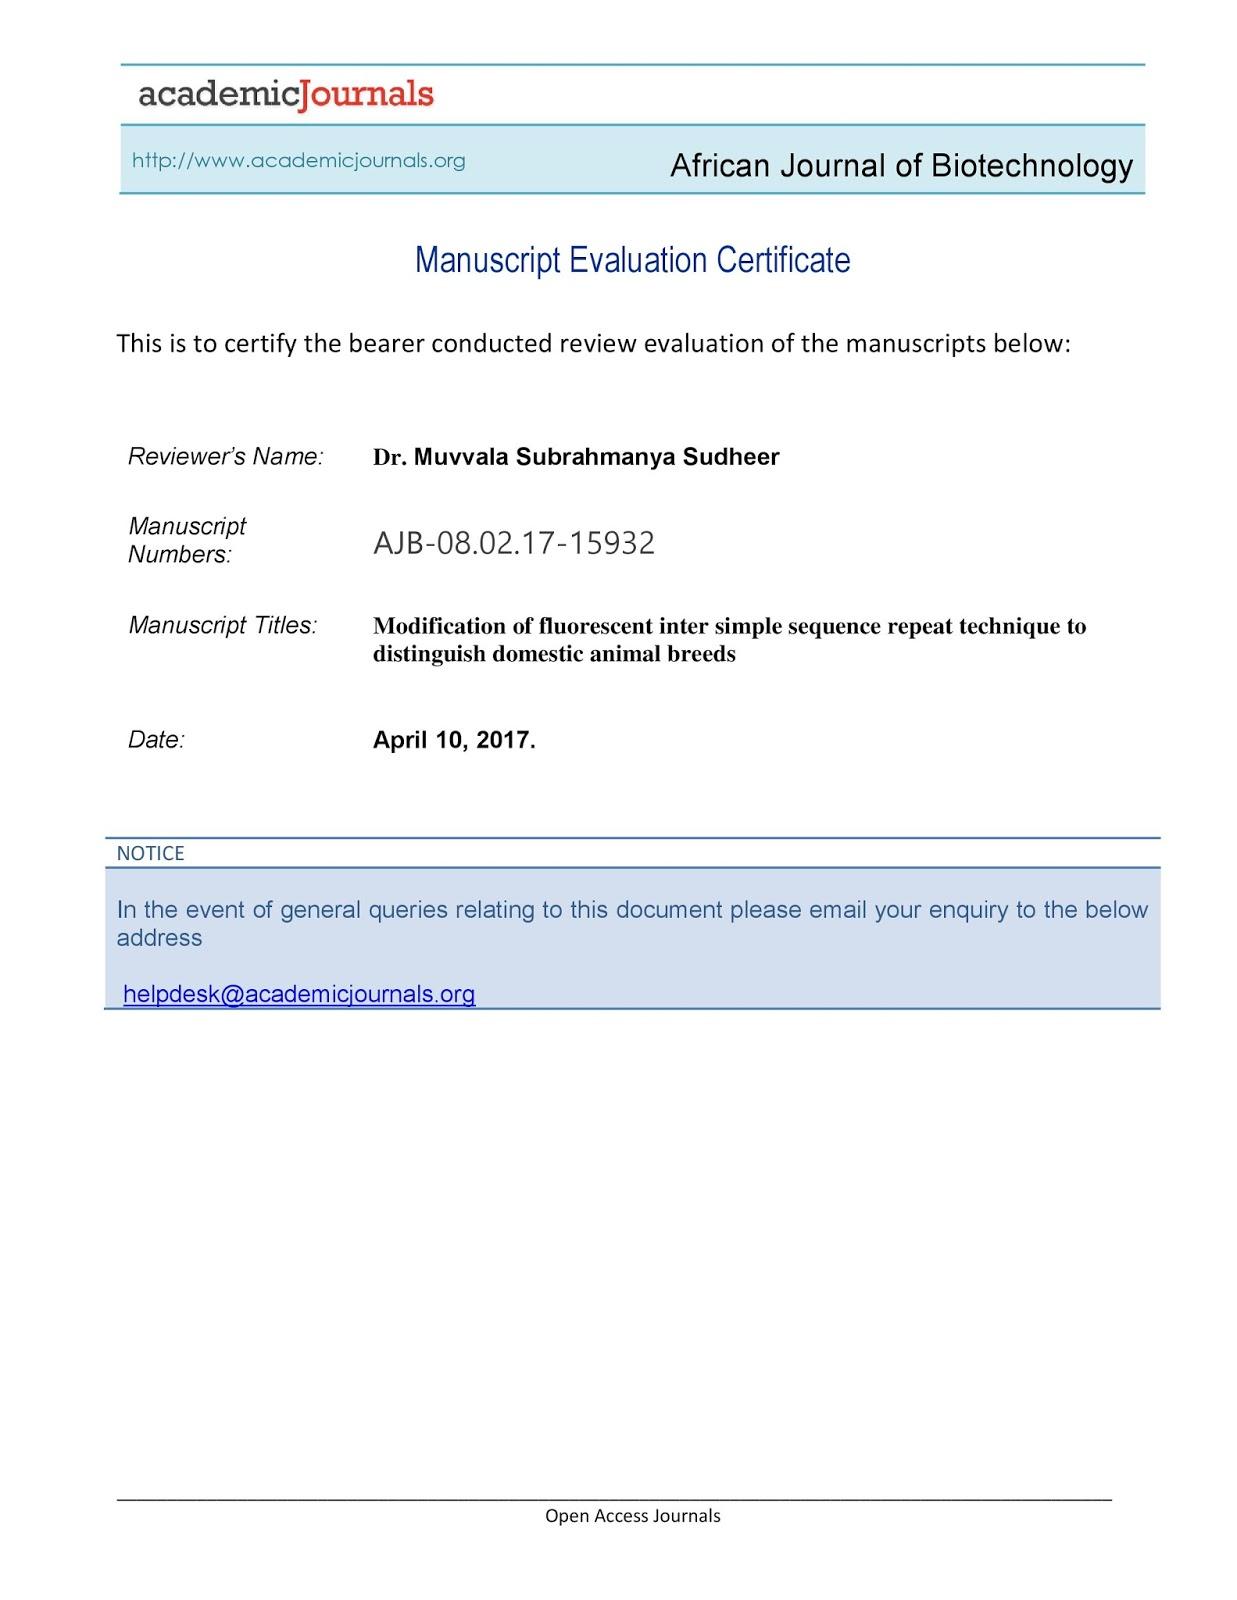 My Achievements 101 Manuscript Evaluation Certificate African